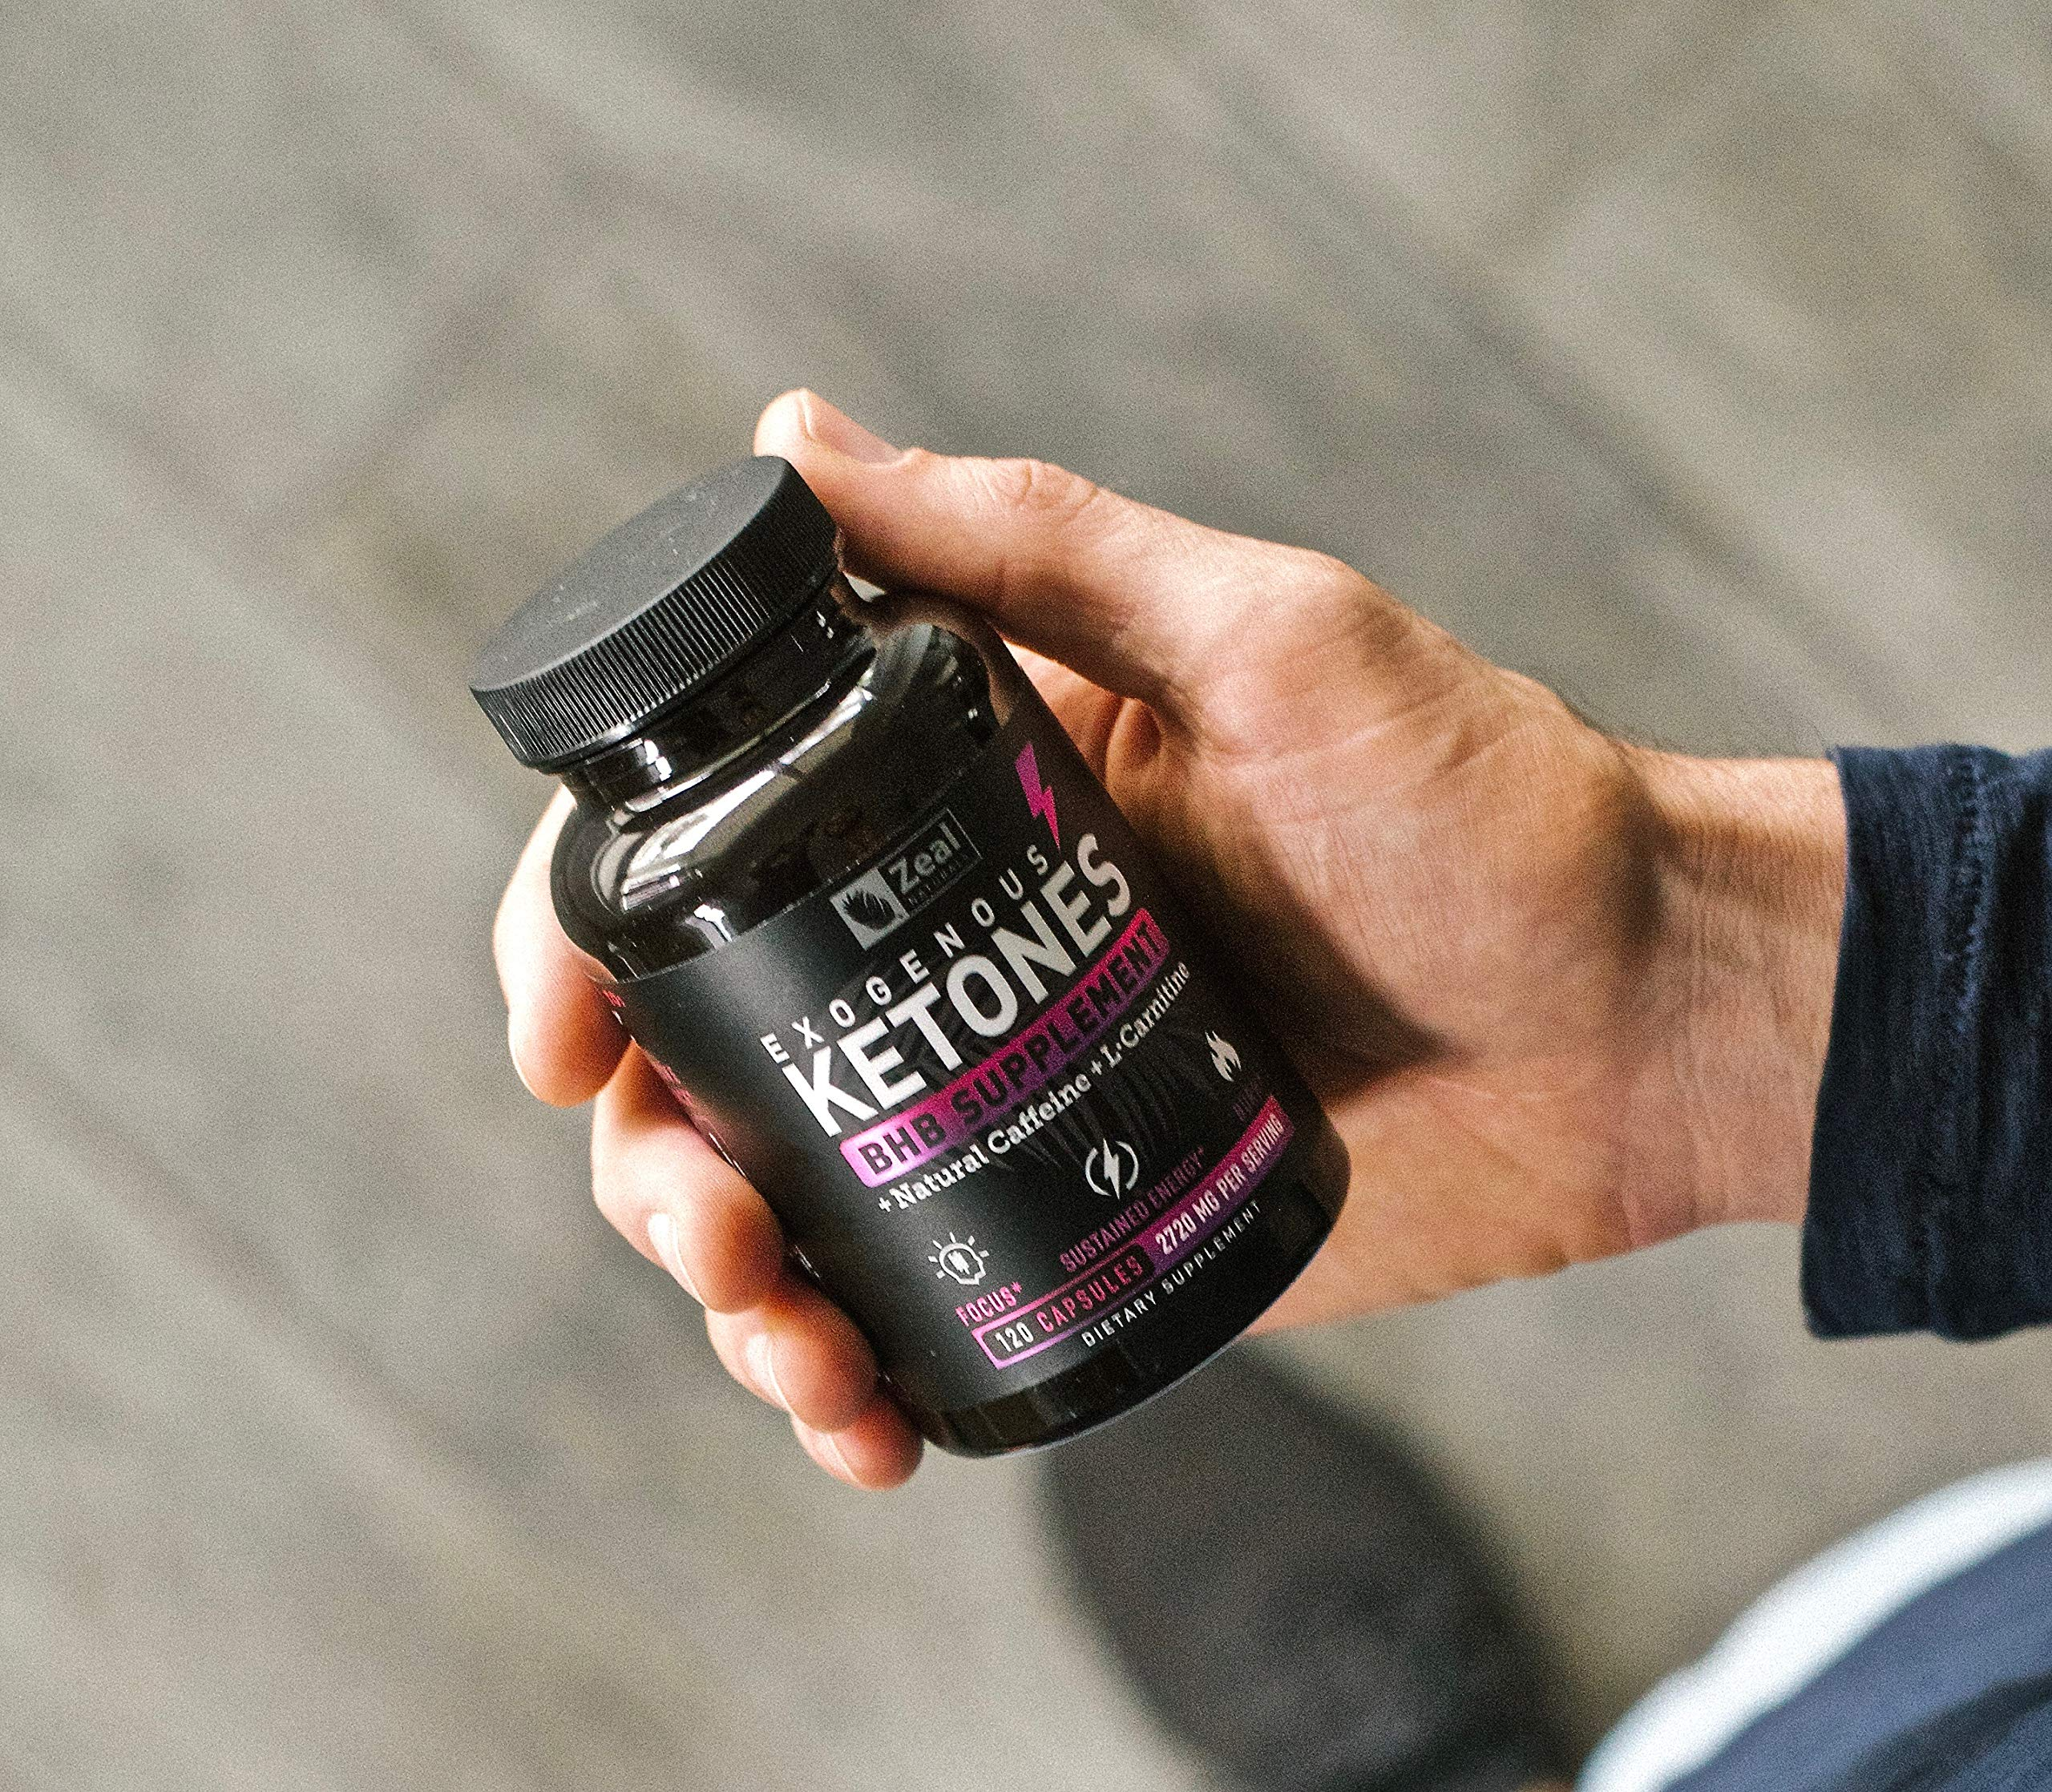 Keto BHB Exogenous Ketones Pills (2720mg | 120 Capsules) Keto Pills w. goBHB Salts, Natural Caffeine & L-Carnitine - Keto BHB Oil Capsules Beta Hydroxybutyrate for Weight Loss Keto Vitamins Keto Salts by Zeal Naturals (Image #9)